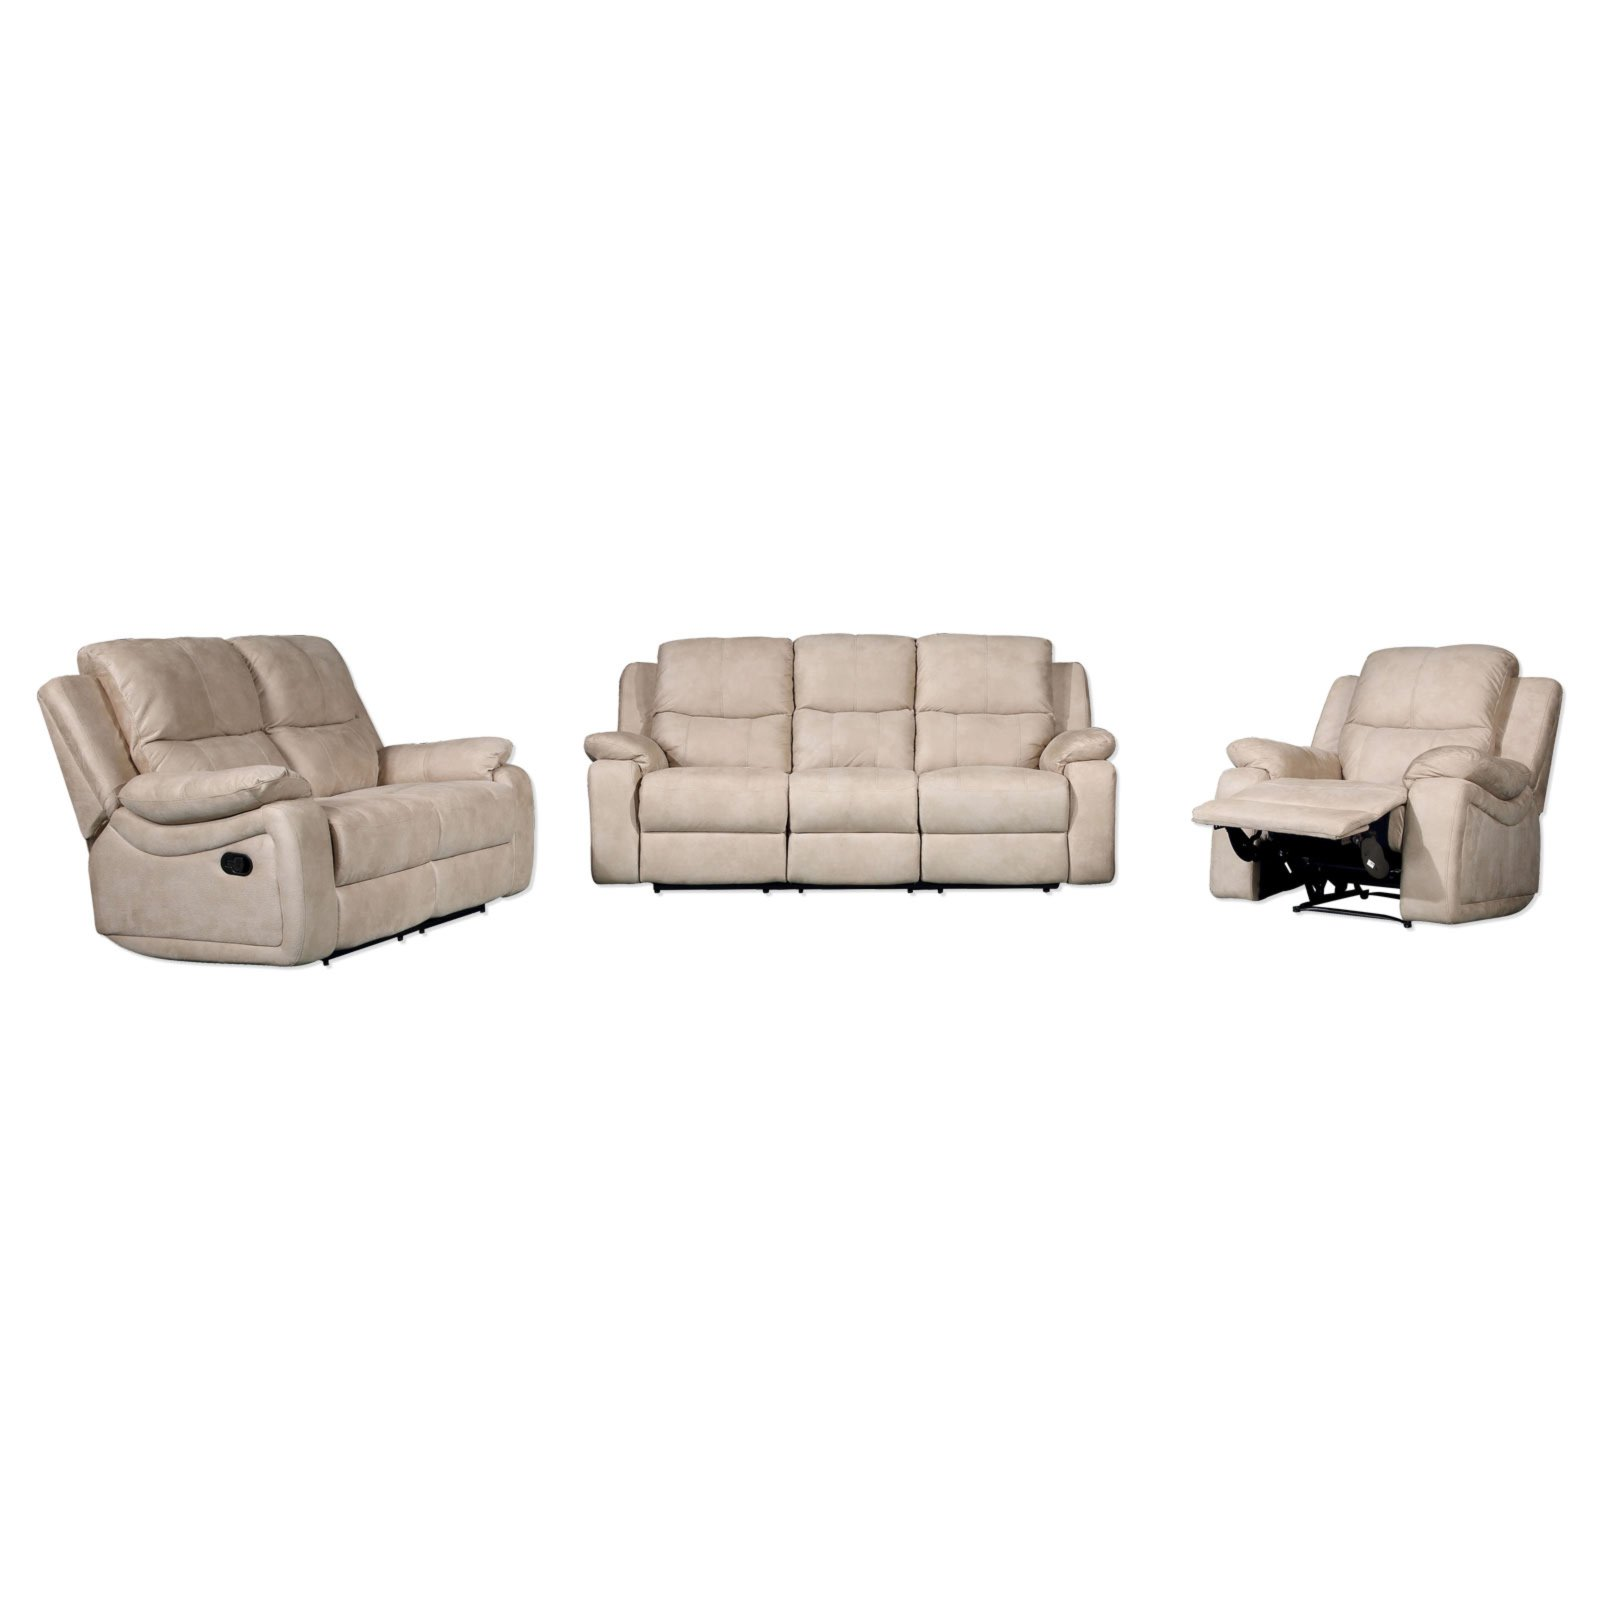 3 teilige polstergarnitur beige relaxfunktion sofagarnituren sets sofas couches. Black Bedroom Furniture Sets. Home Design Ideas